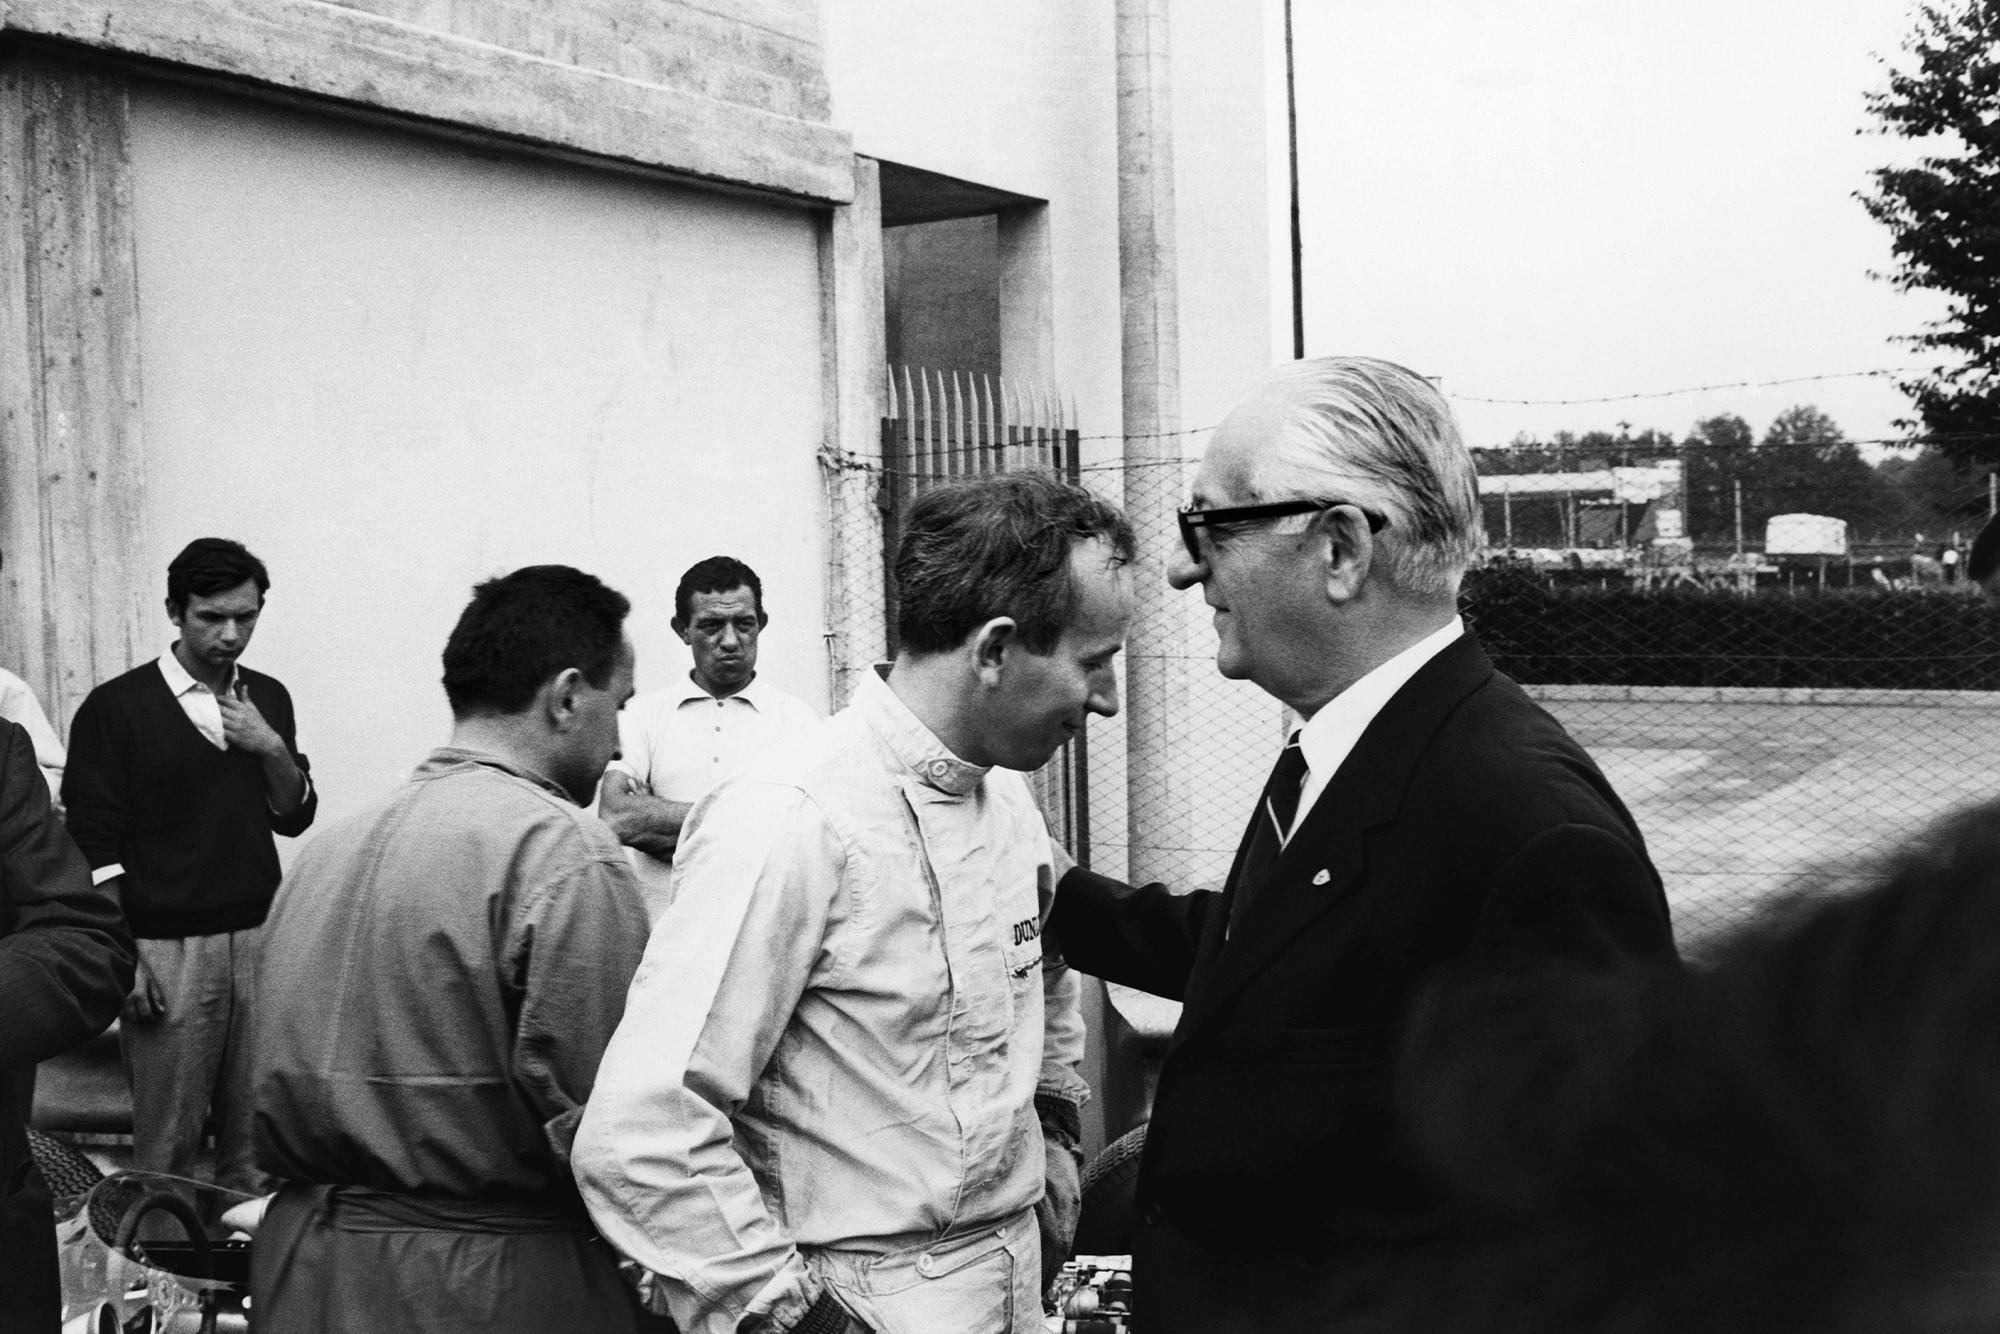 John Surtees with Ferrari team boss Enzo Ferrari talk in the pits.